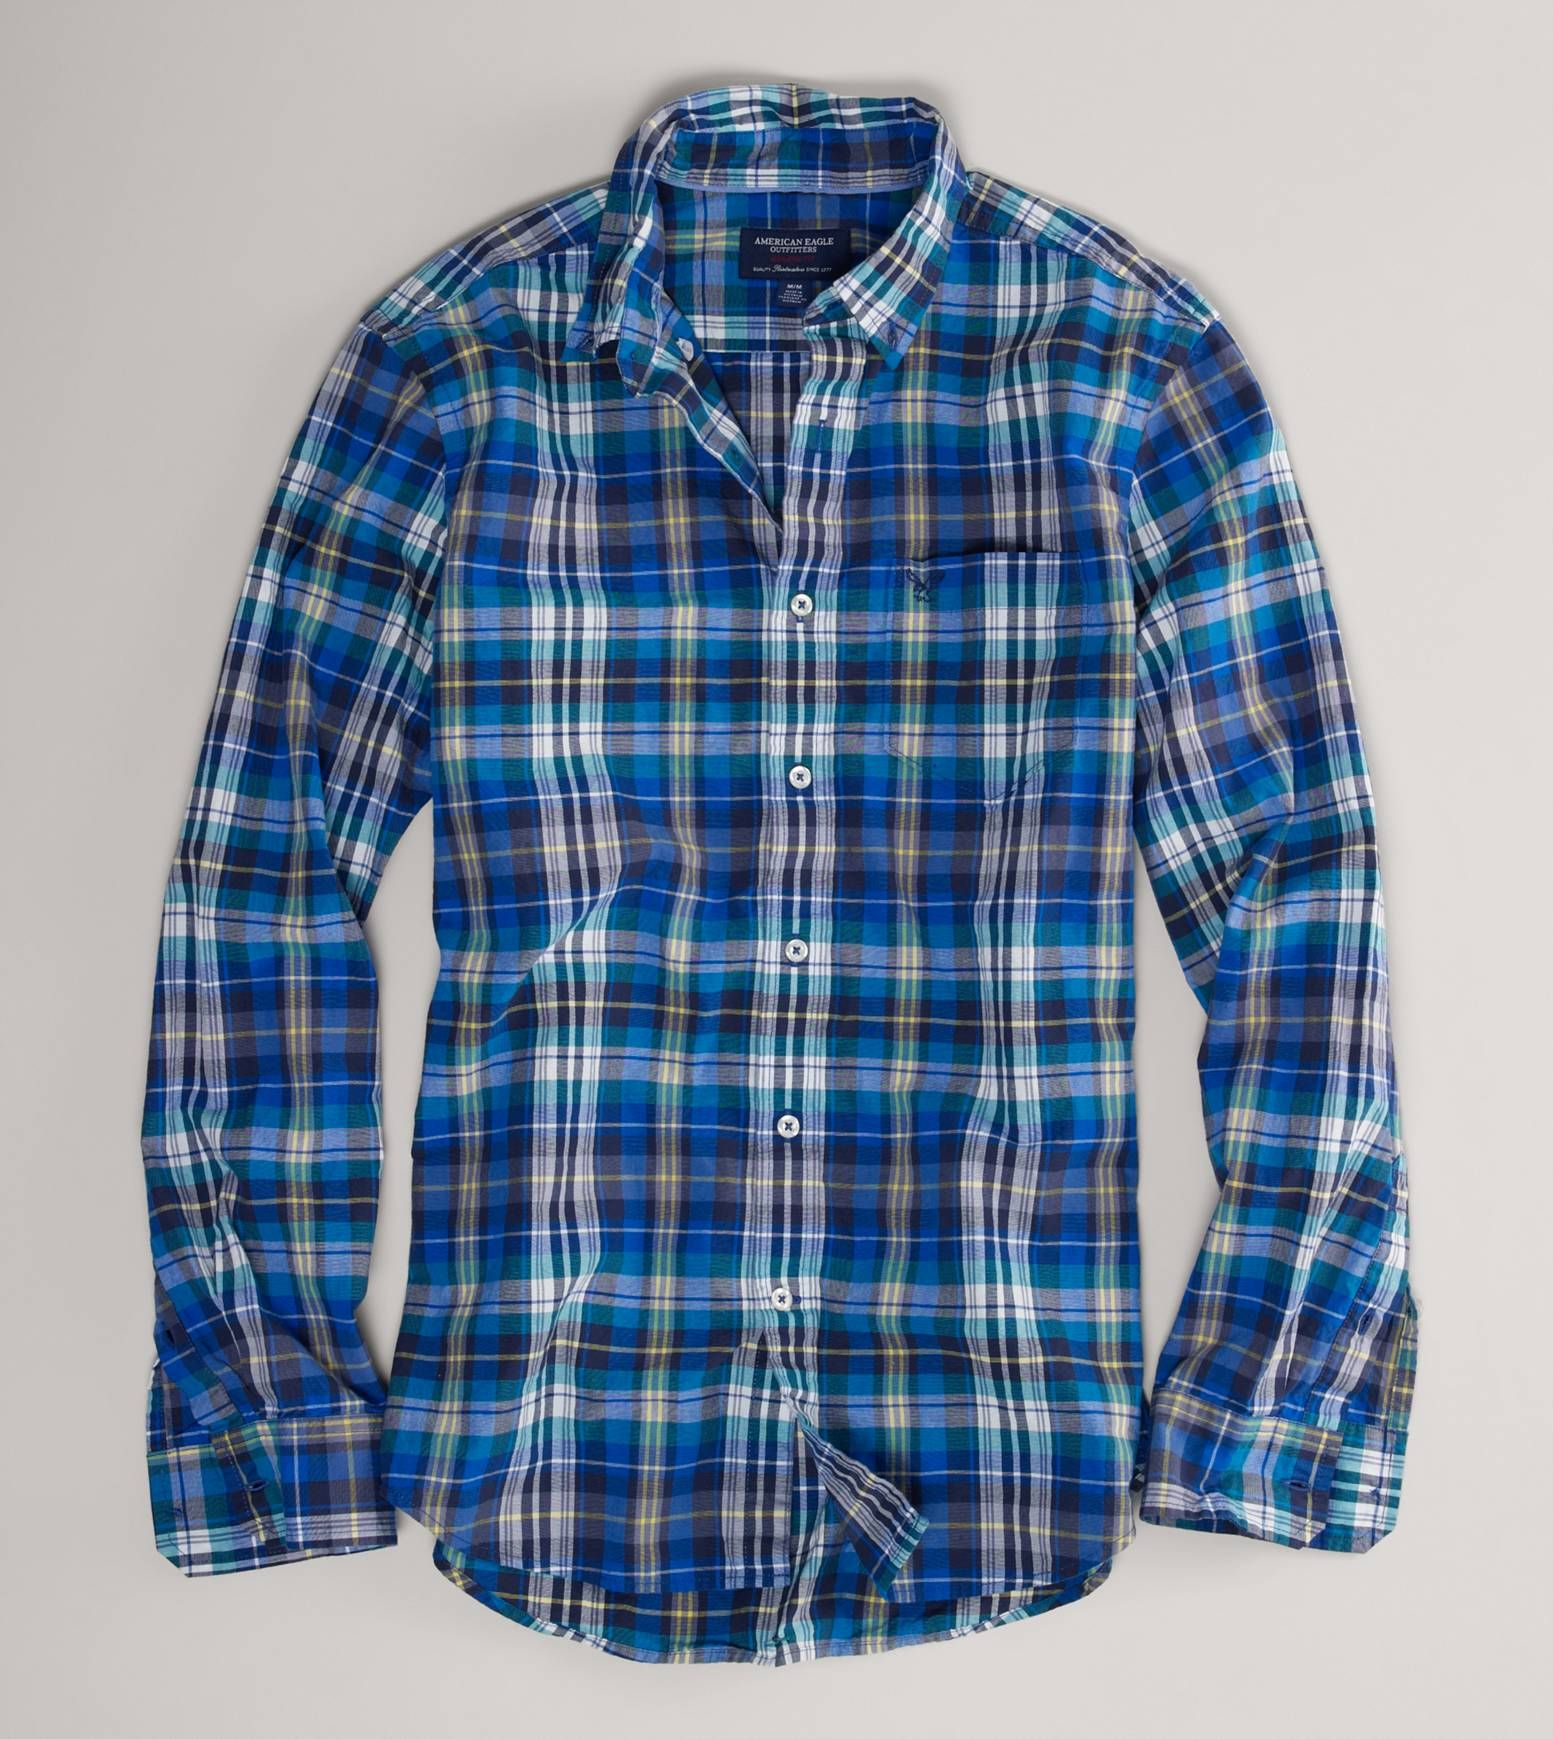 American Eagle men's flanel shirt